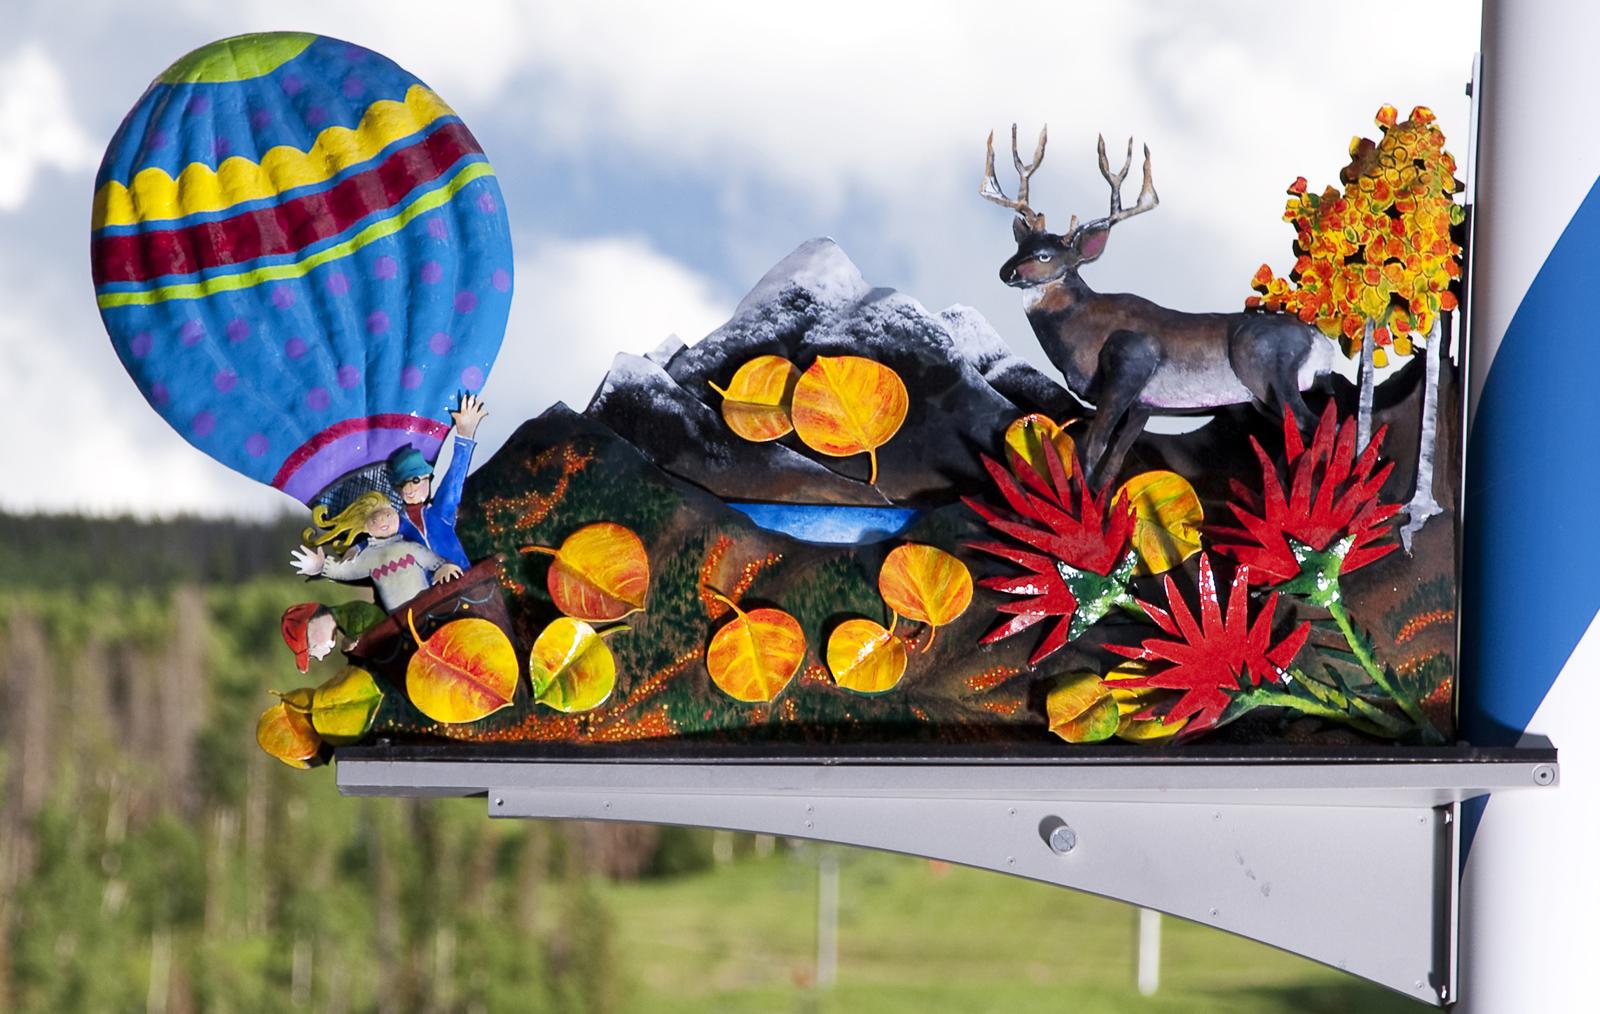 Flora & Fauna: Seasons of Vail Maypole